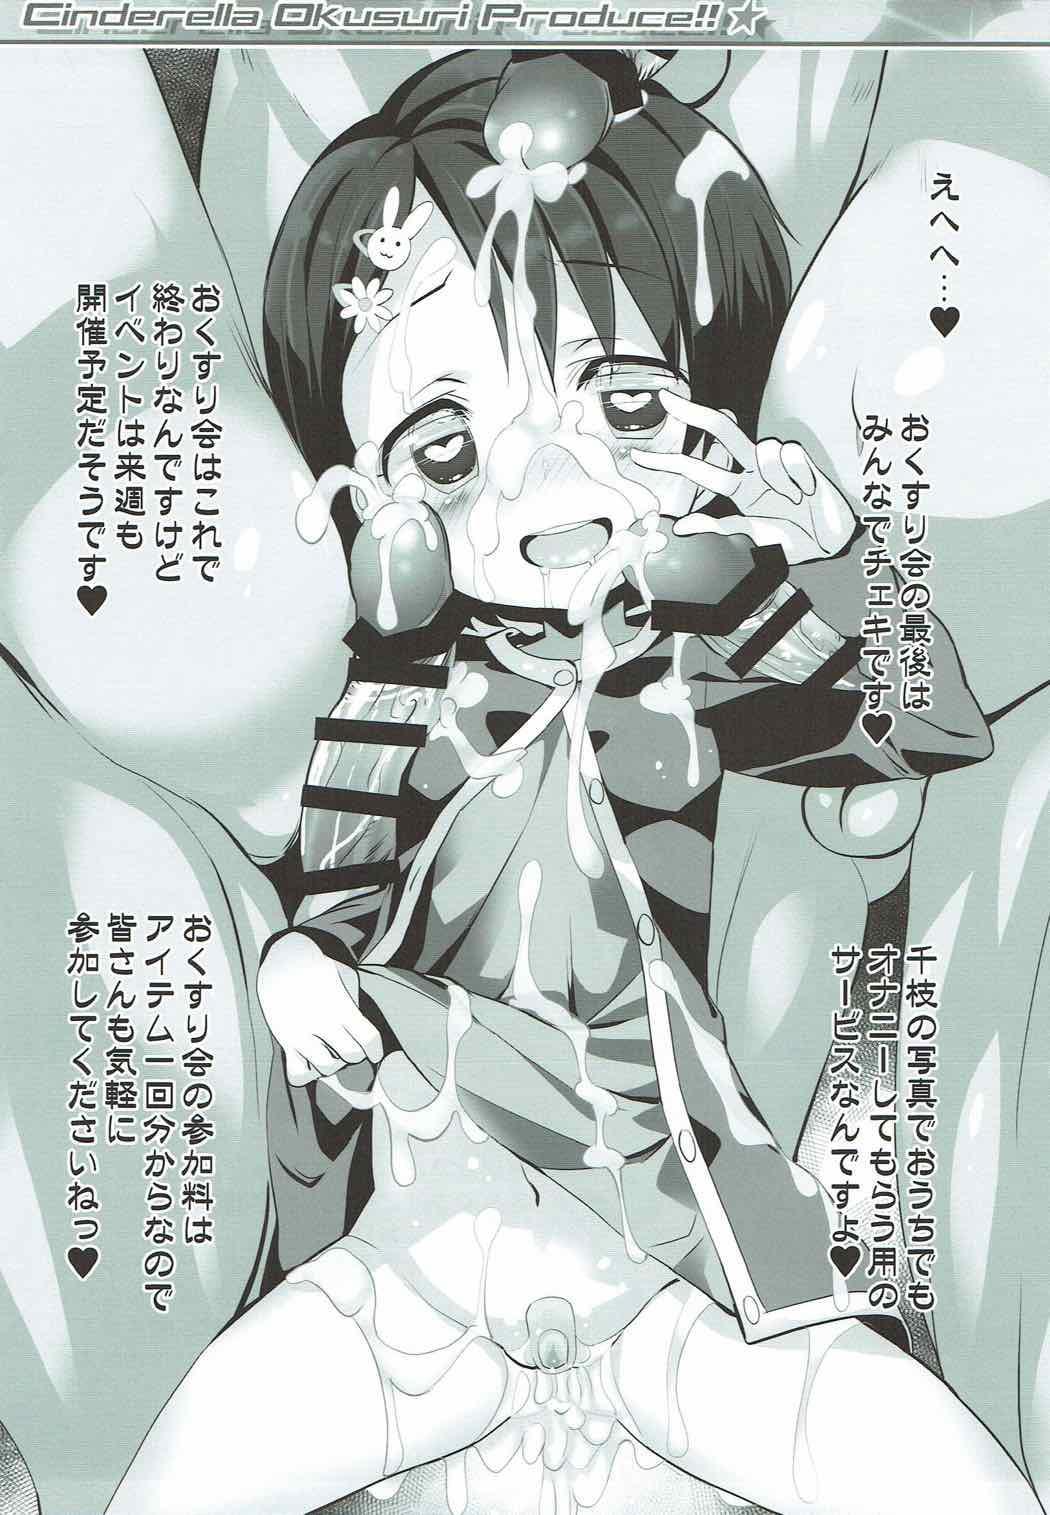 Cinderella Okusuri Produce!!★ 7